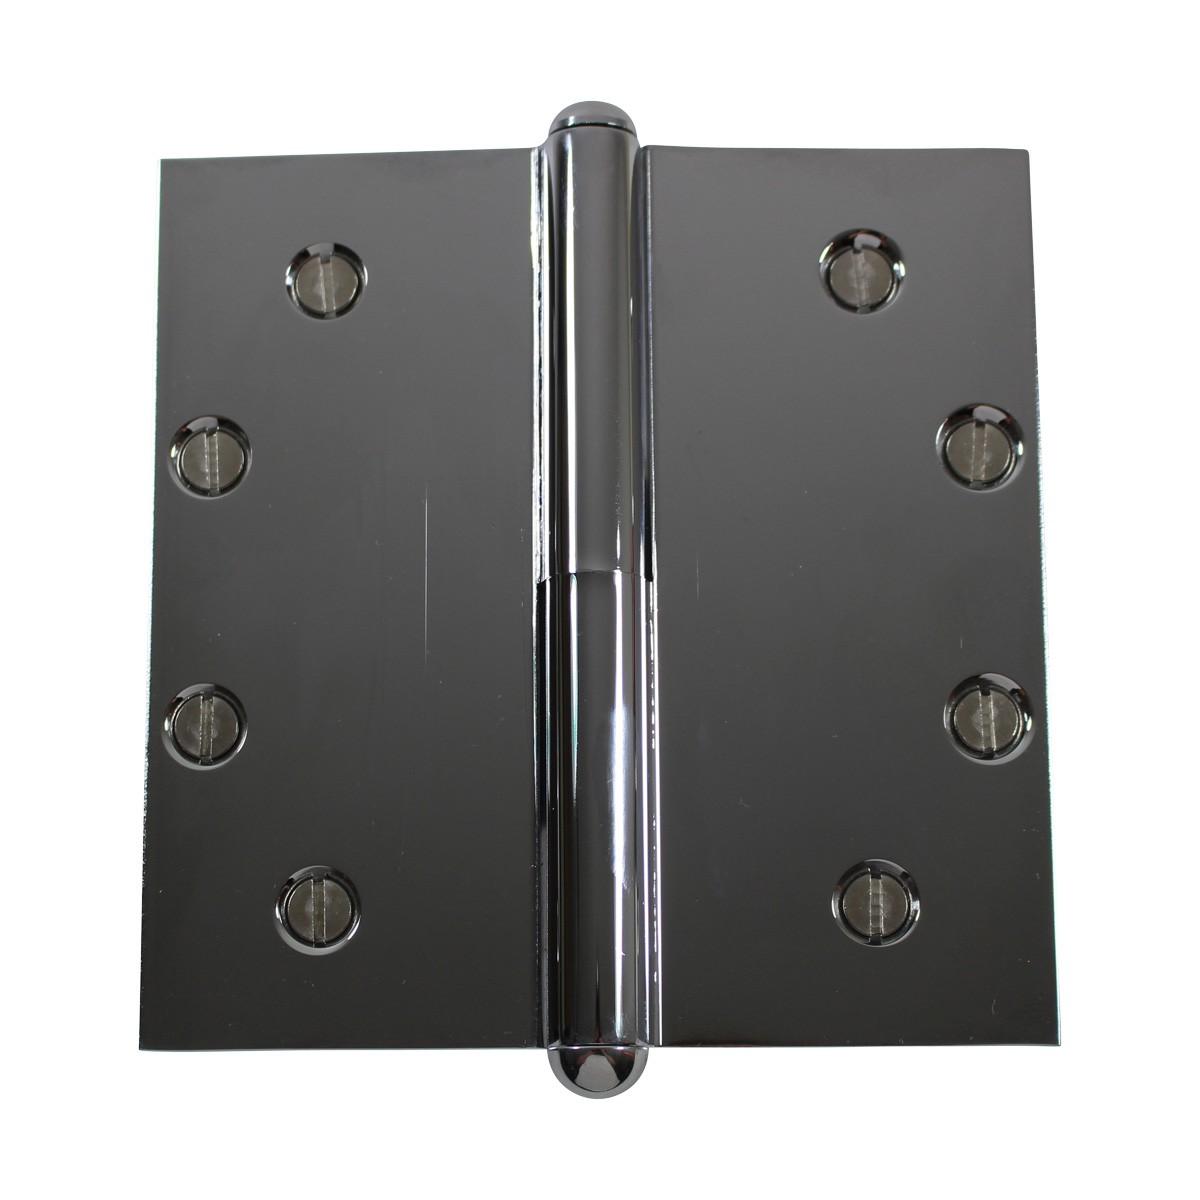 5 in. Lift Off Right Chrome Brass Door Hinge Button Tip Door Hinges Door Hinge Solid Brass Hinge